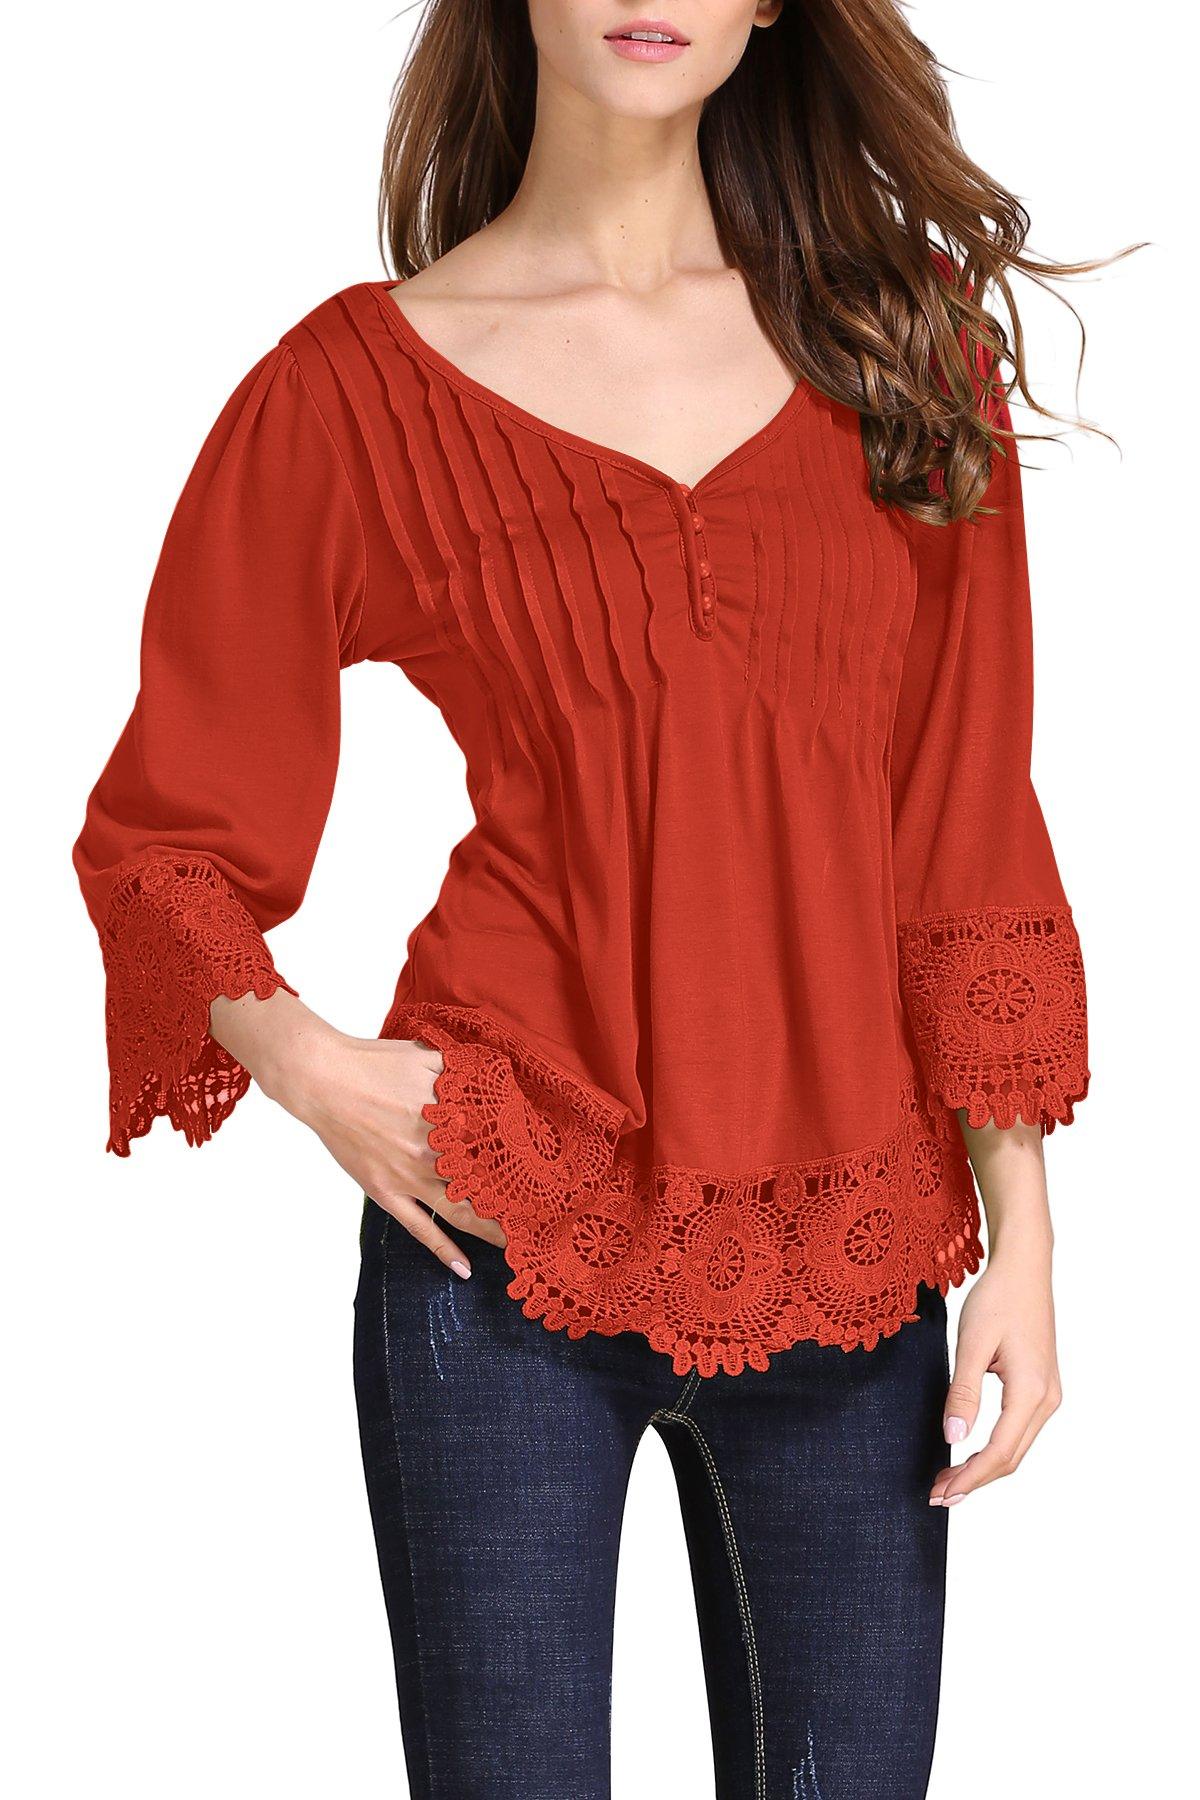 OMZIN Women's Cotton Long Sleeve Lightweight Tunic Tops Water Red 3XL